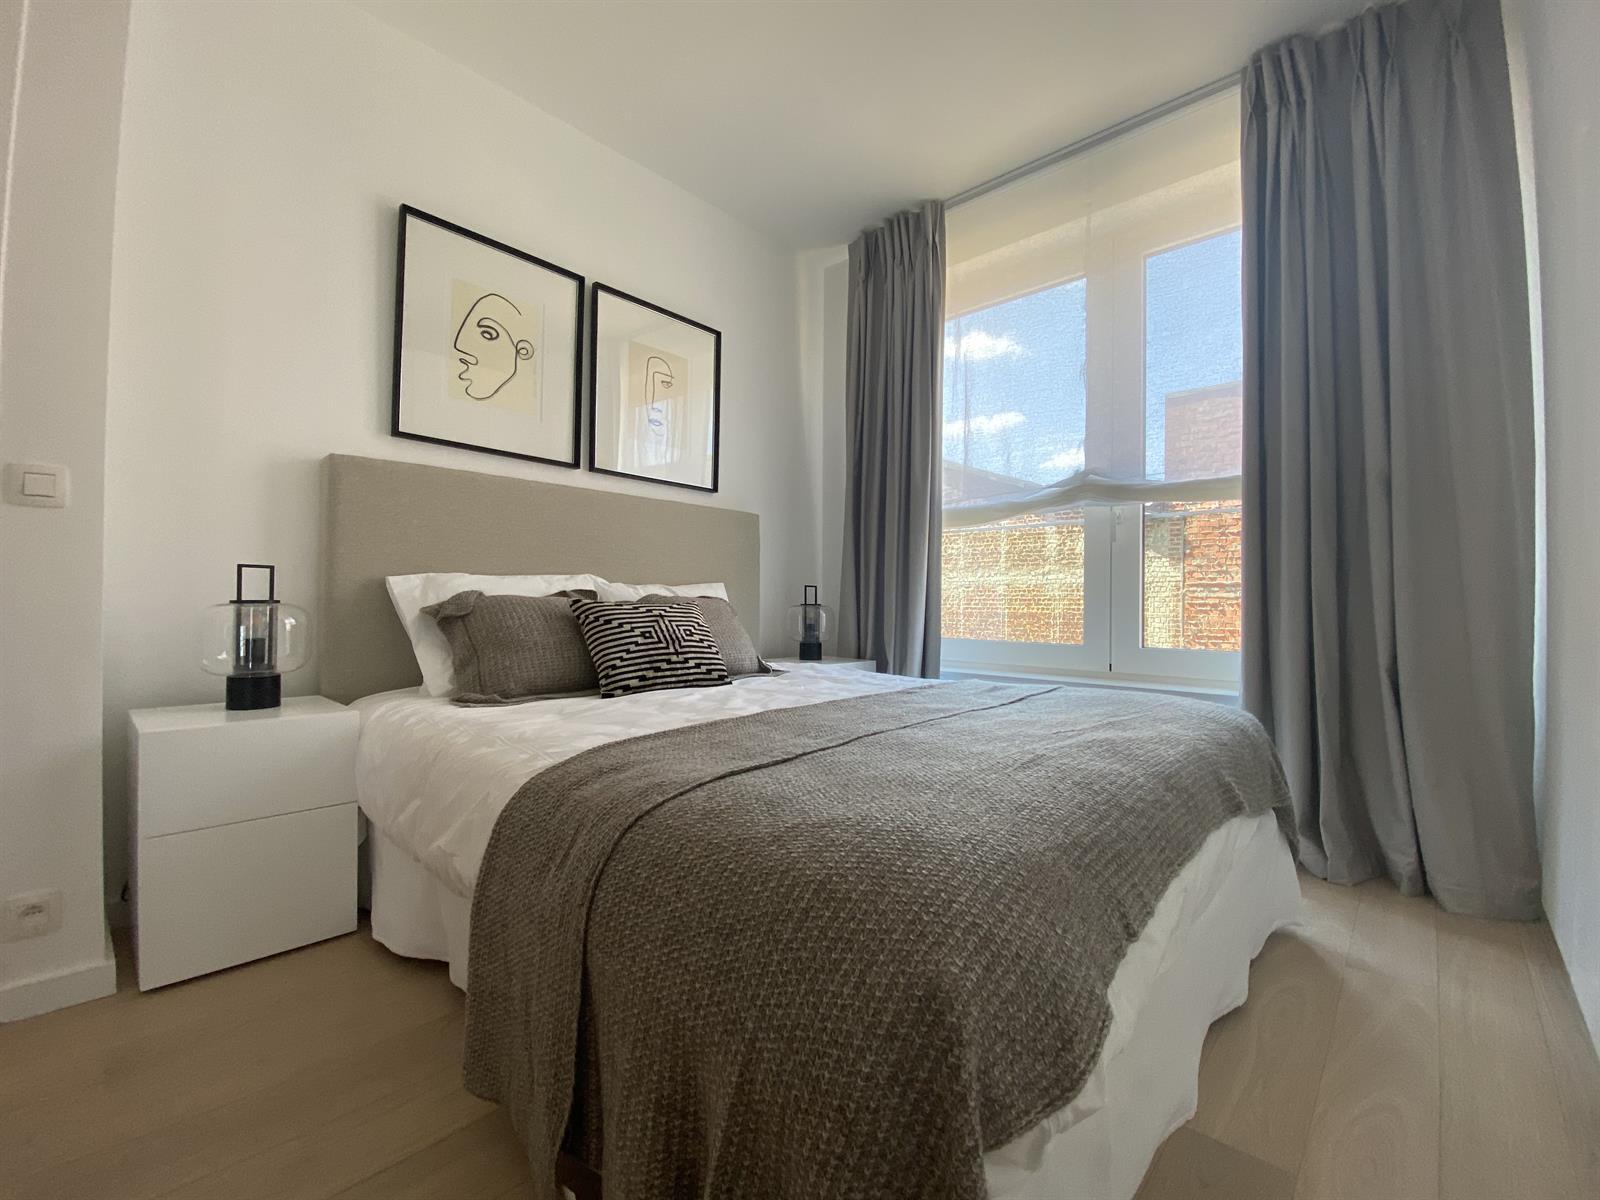 Appartement - Woluwe-Saint-Lambert - #4455478-9